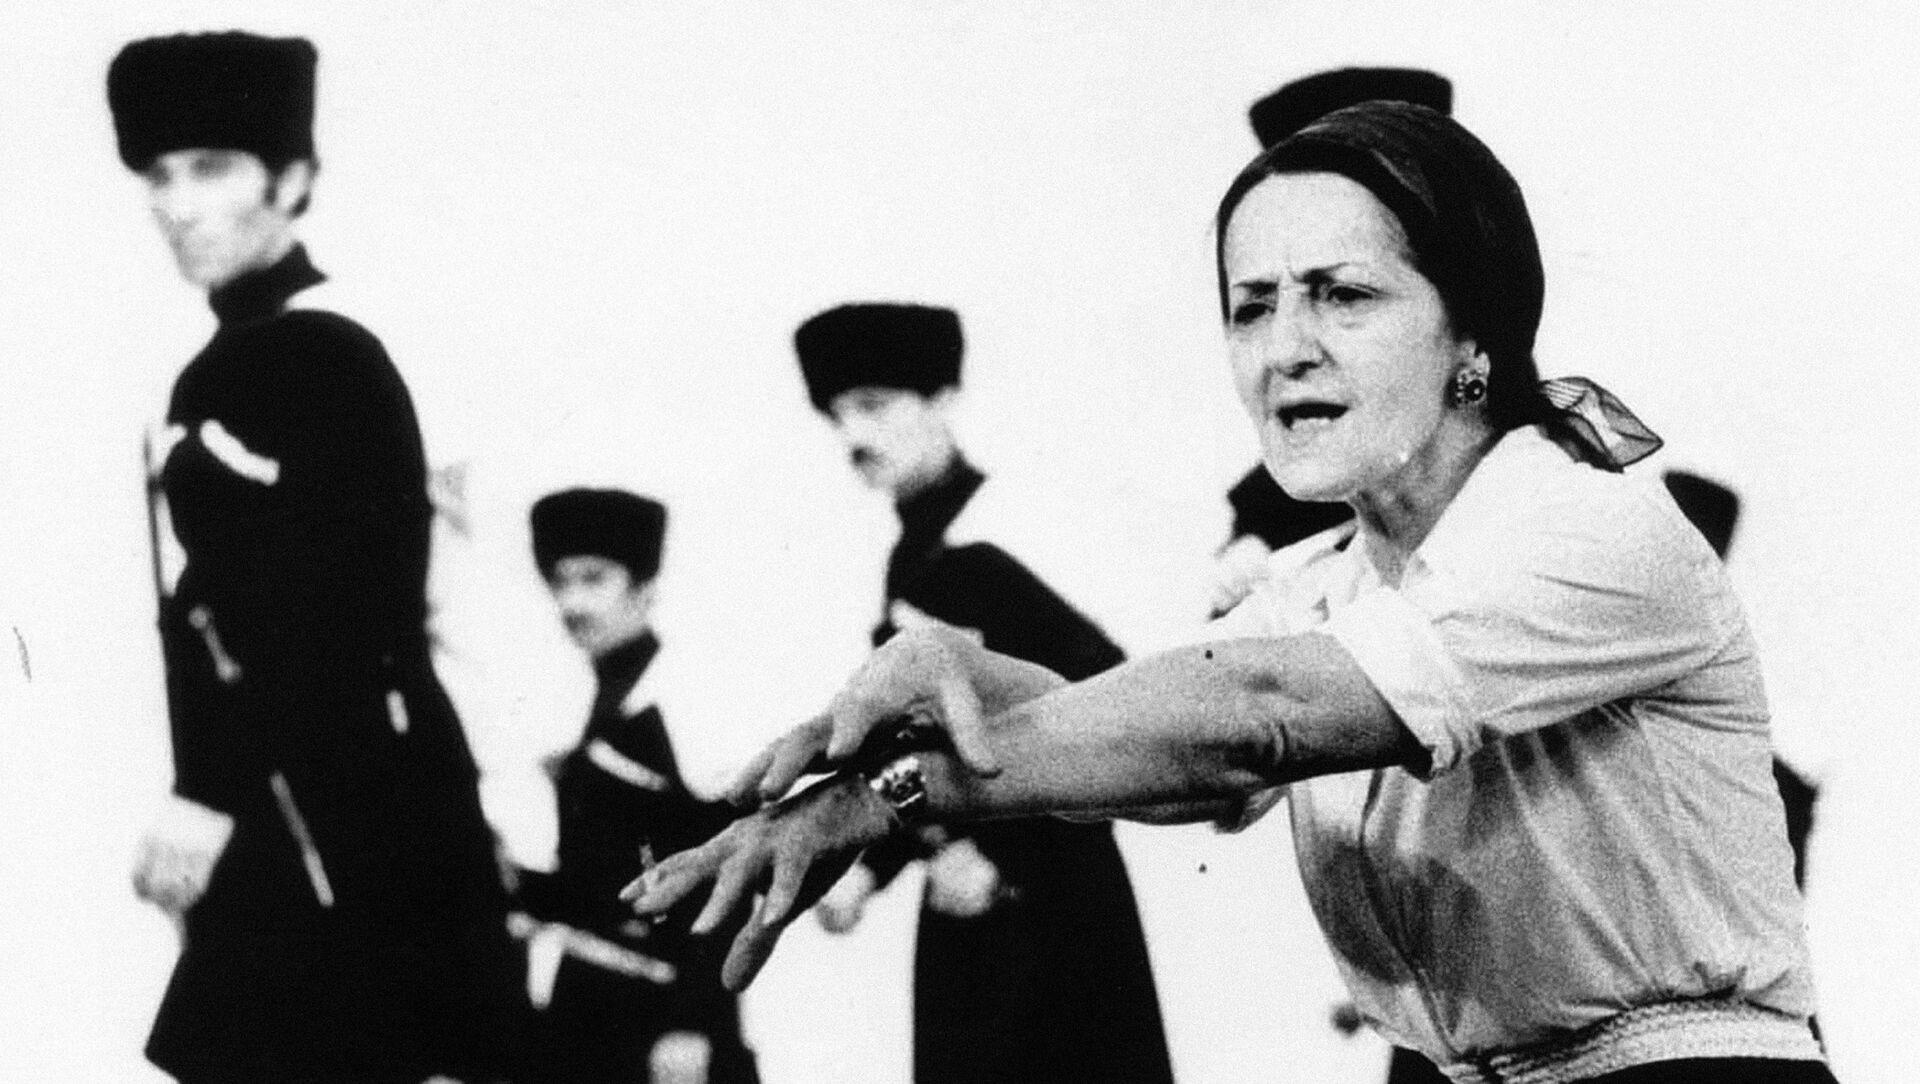 Балетмейстер, народная артистка СССР Нина Шалвовна Рамишвили - Sputnik Грузия, 1920, 08.03.2021